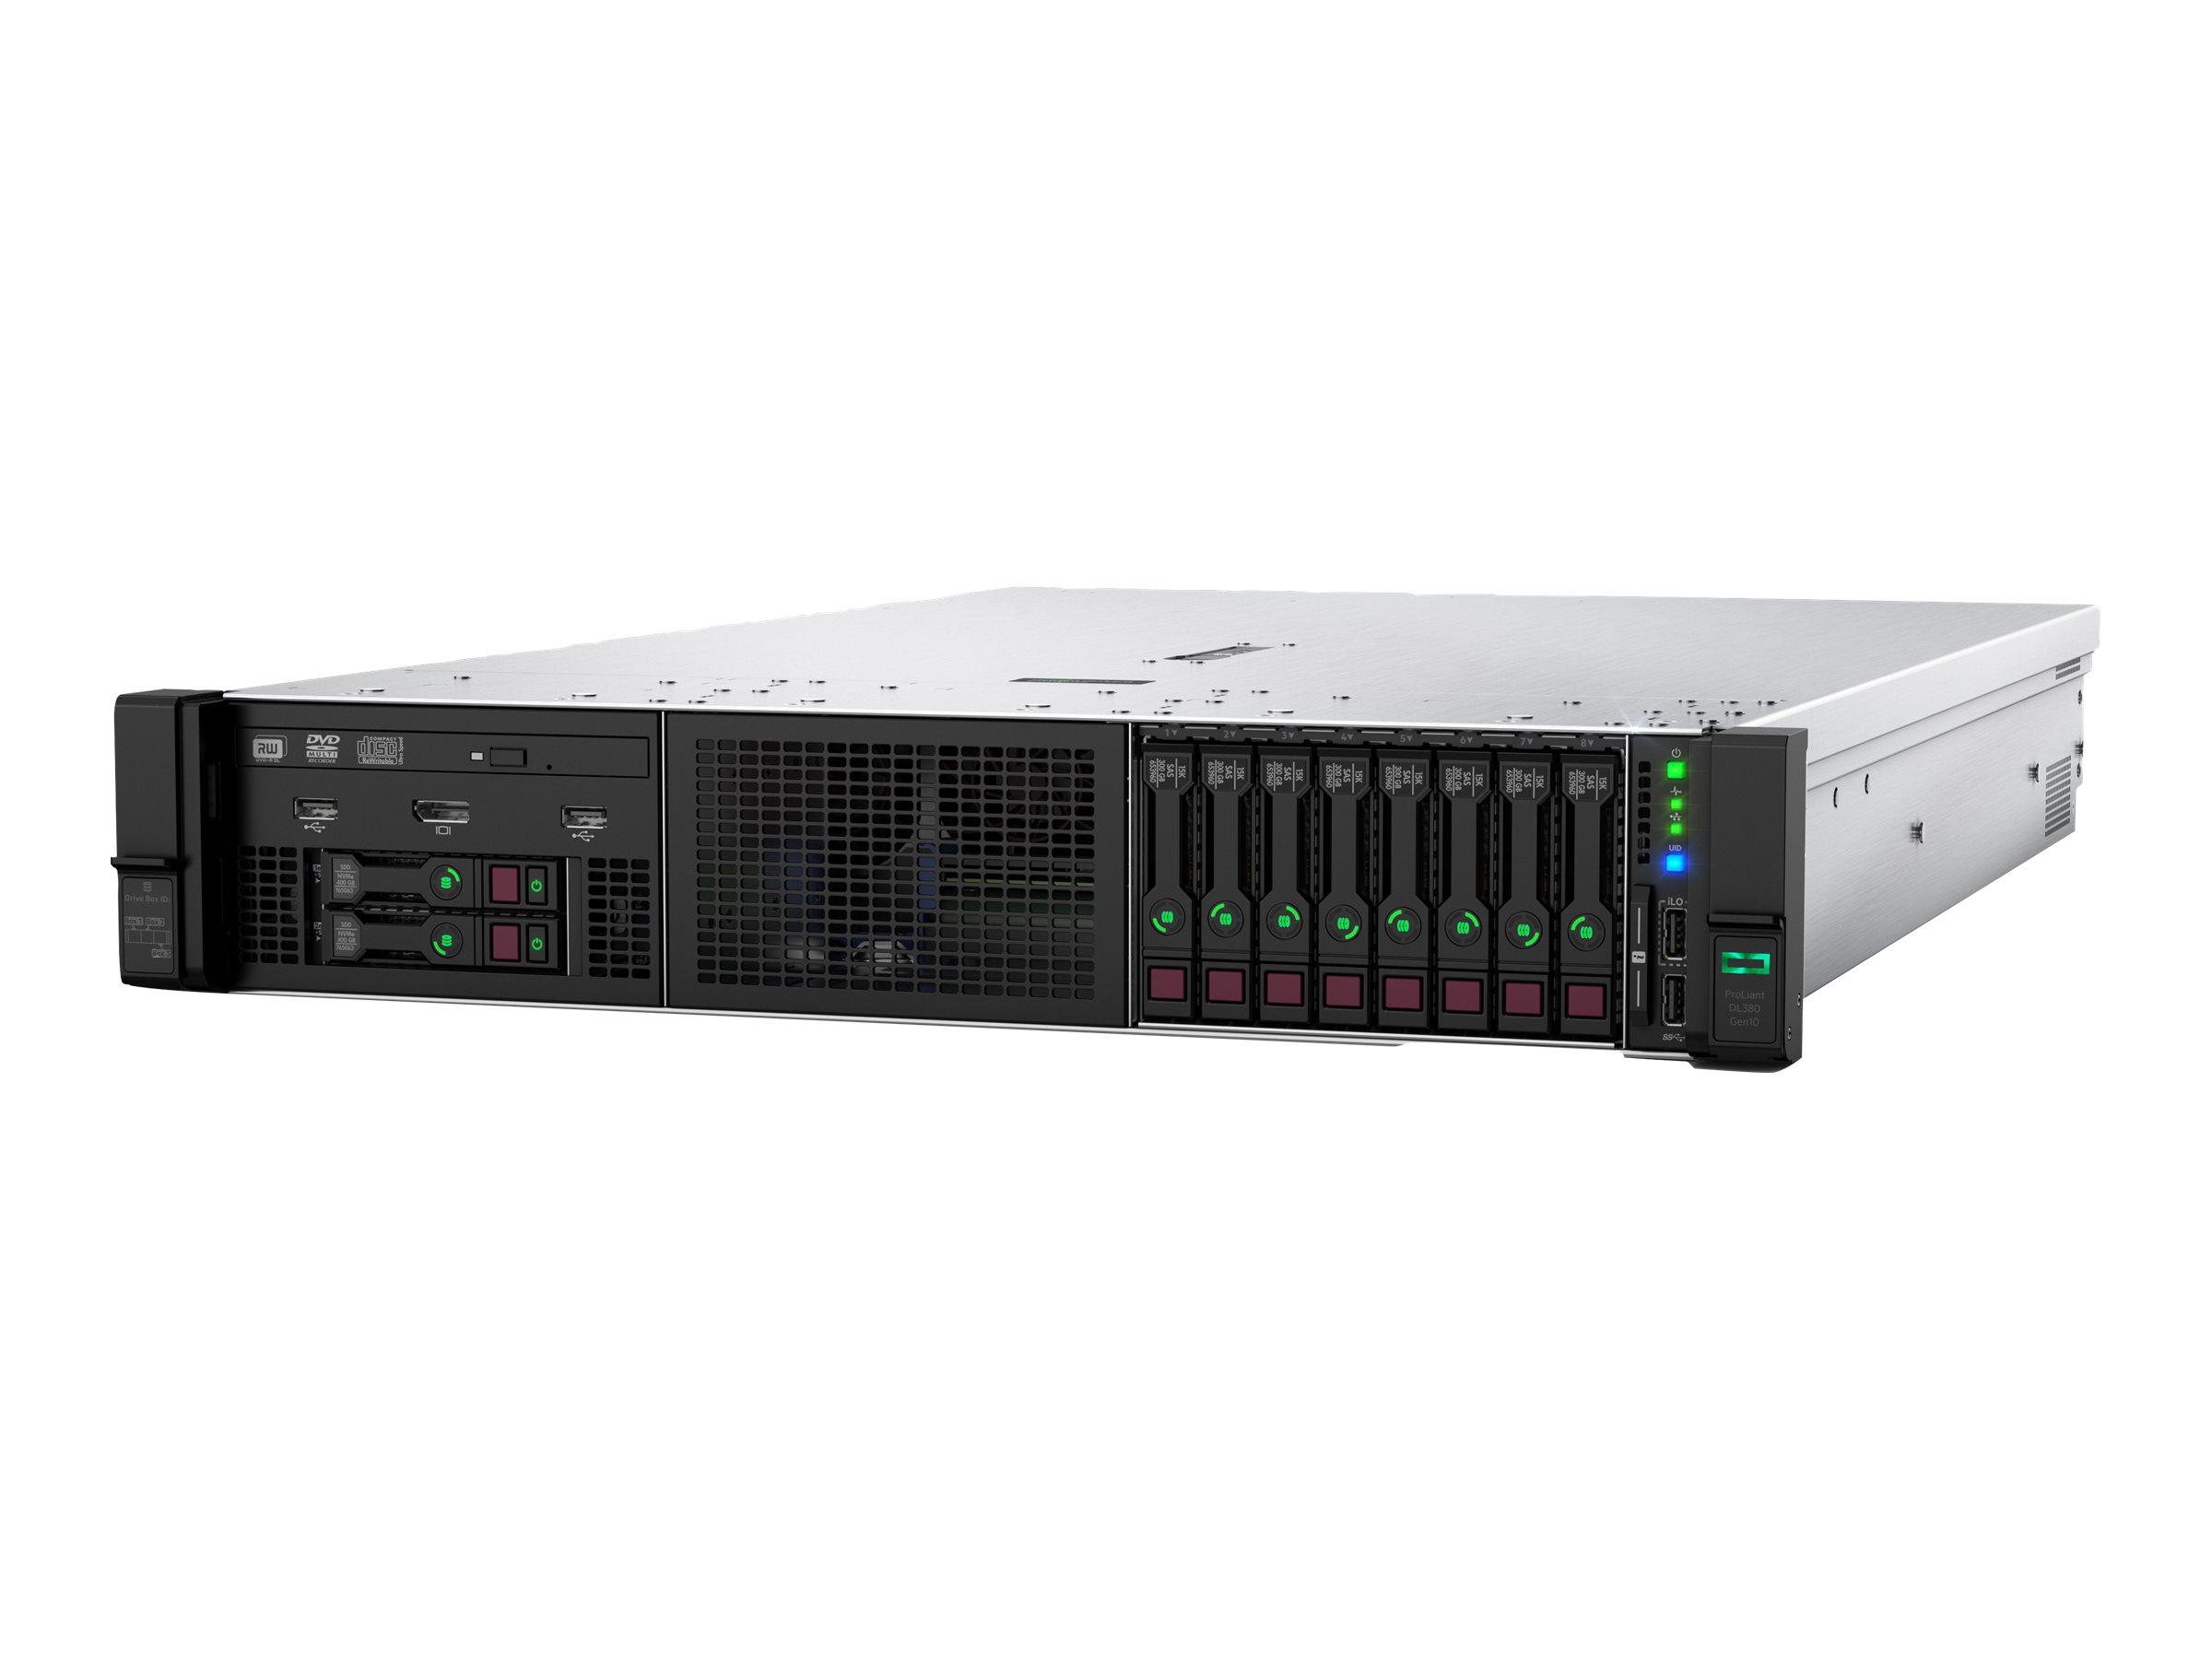 "HPE ProLiant DL380 Gen10 Network Choice - Server - Rack-Montage - 2U - zweiweg - 1 x Xeon Silver 4215R / 3.2 GHz - RAM 32 GB - SATA/SAS - Hot-Swap 6.4 cm (2.5"")"